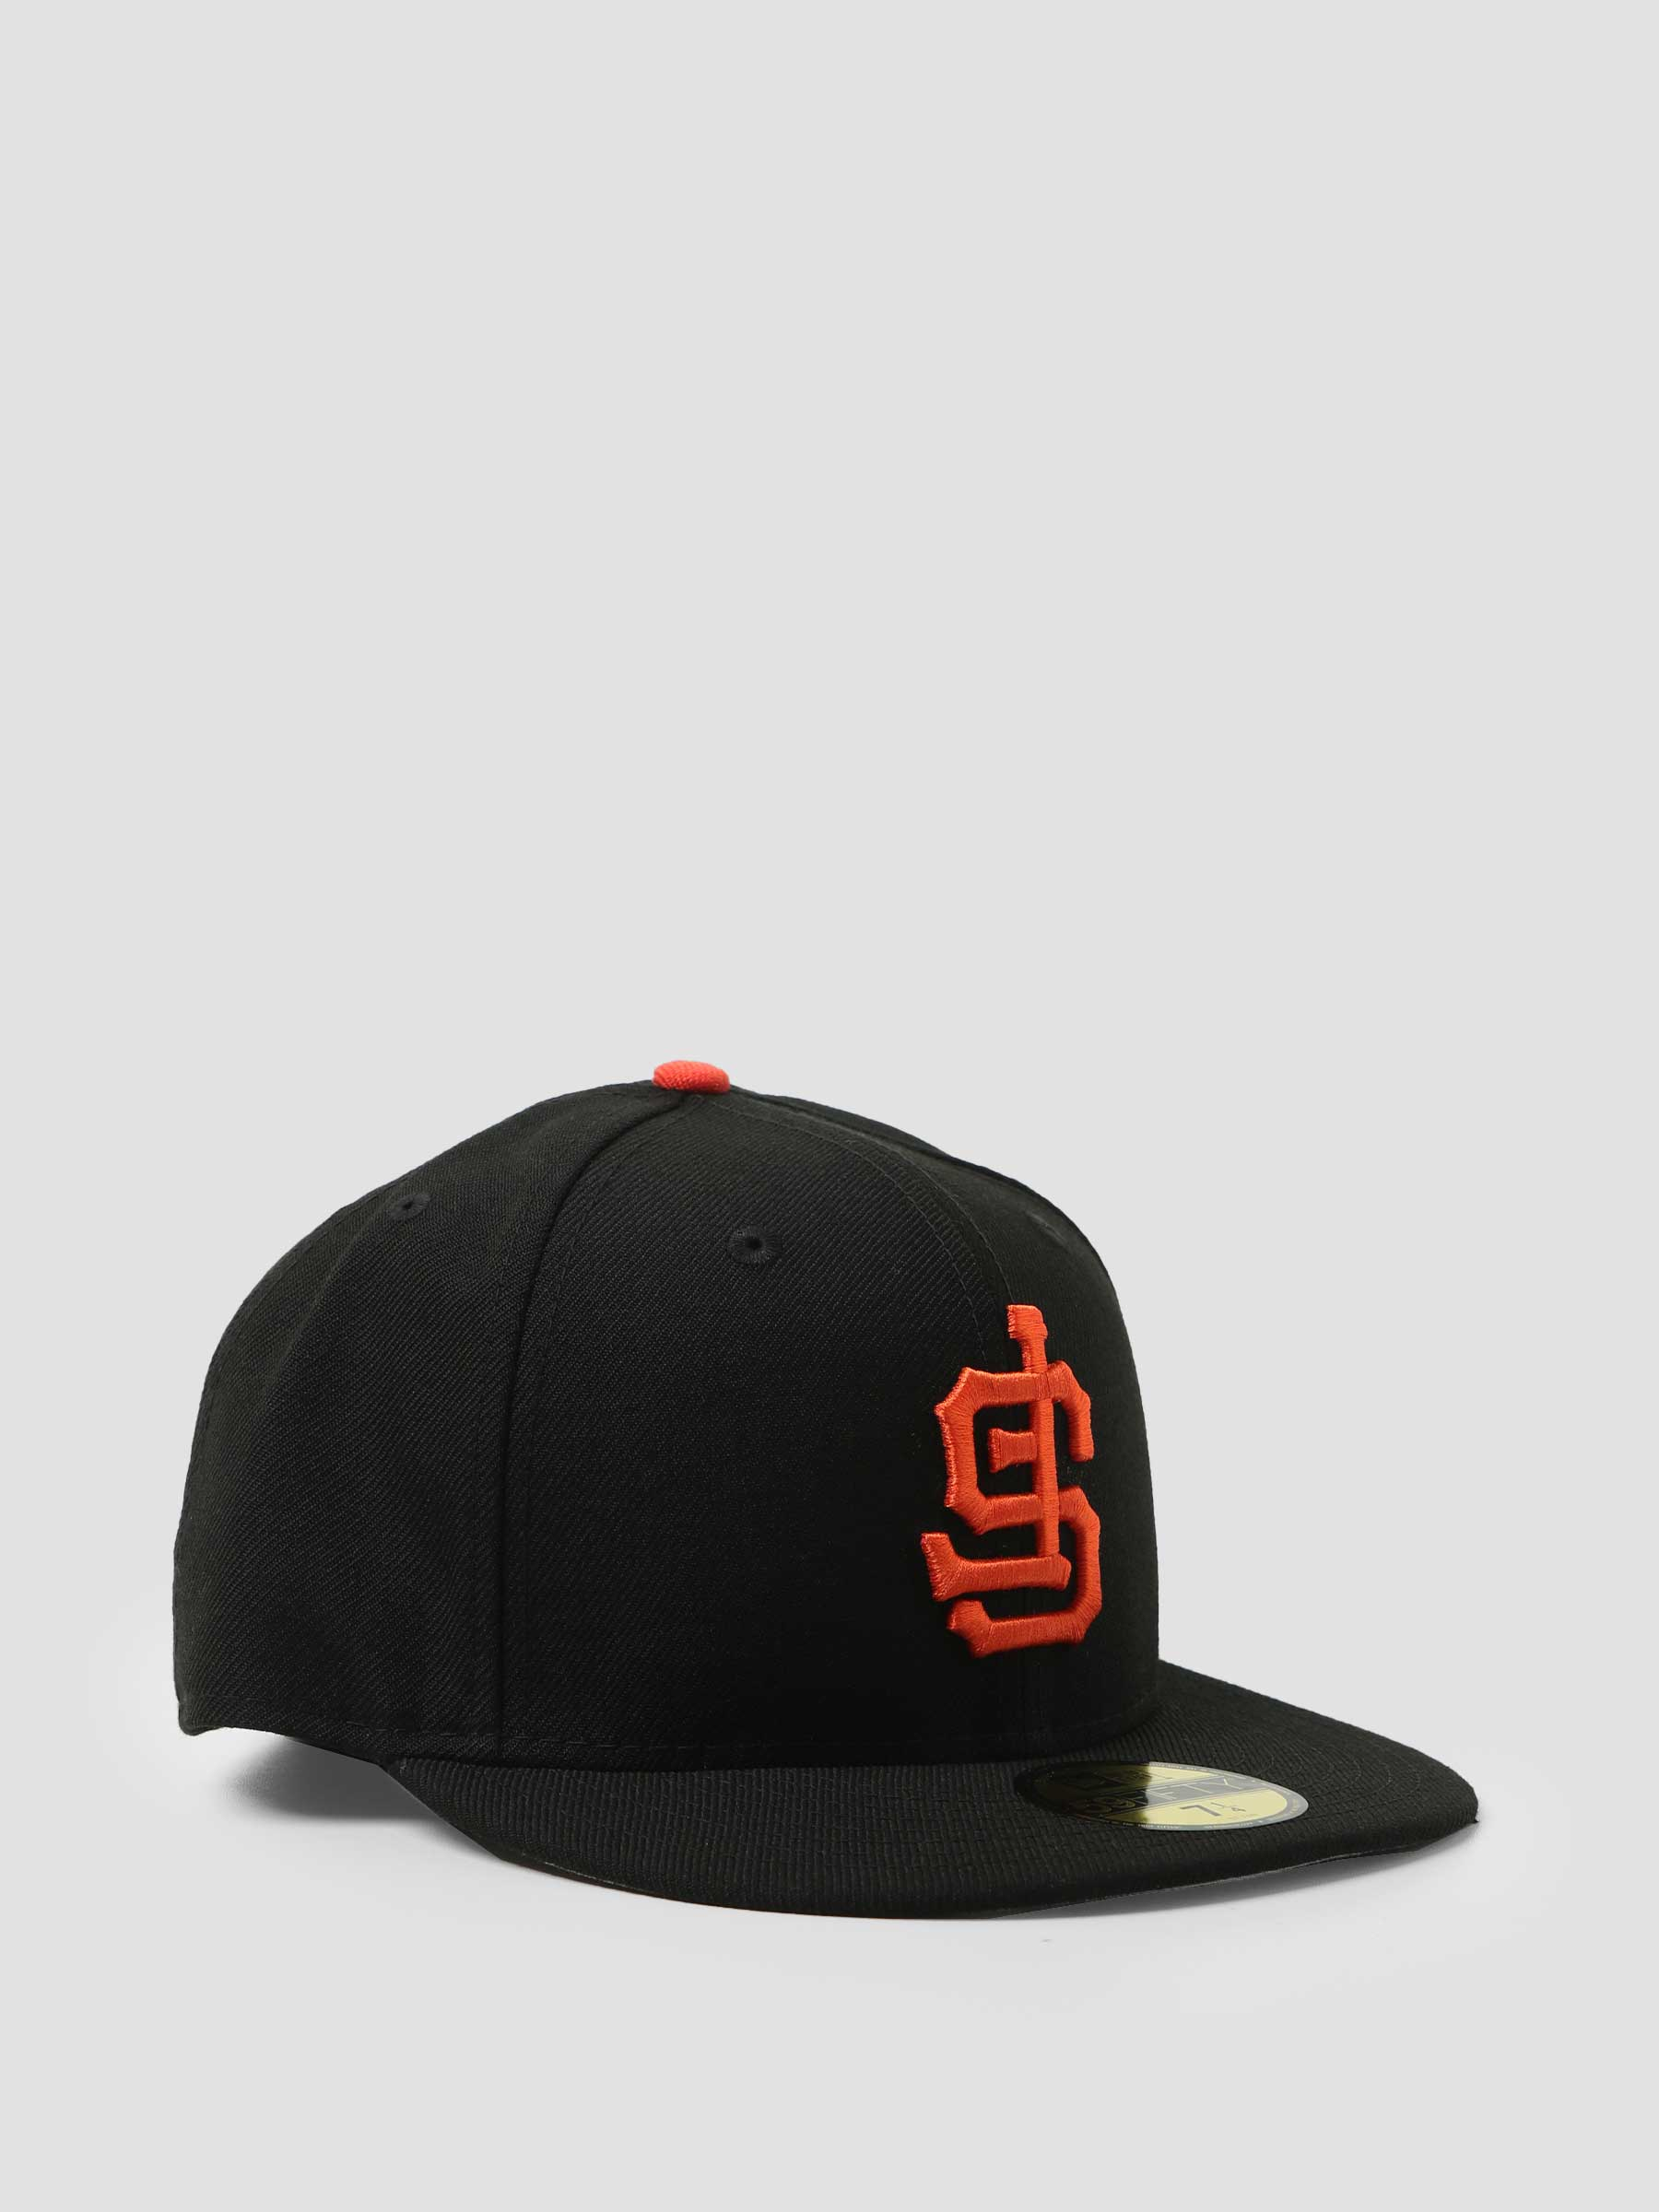 59Fifty San Francisco Giants Upside Down 60180822